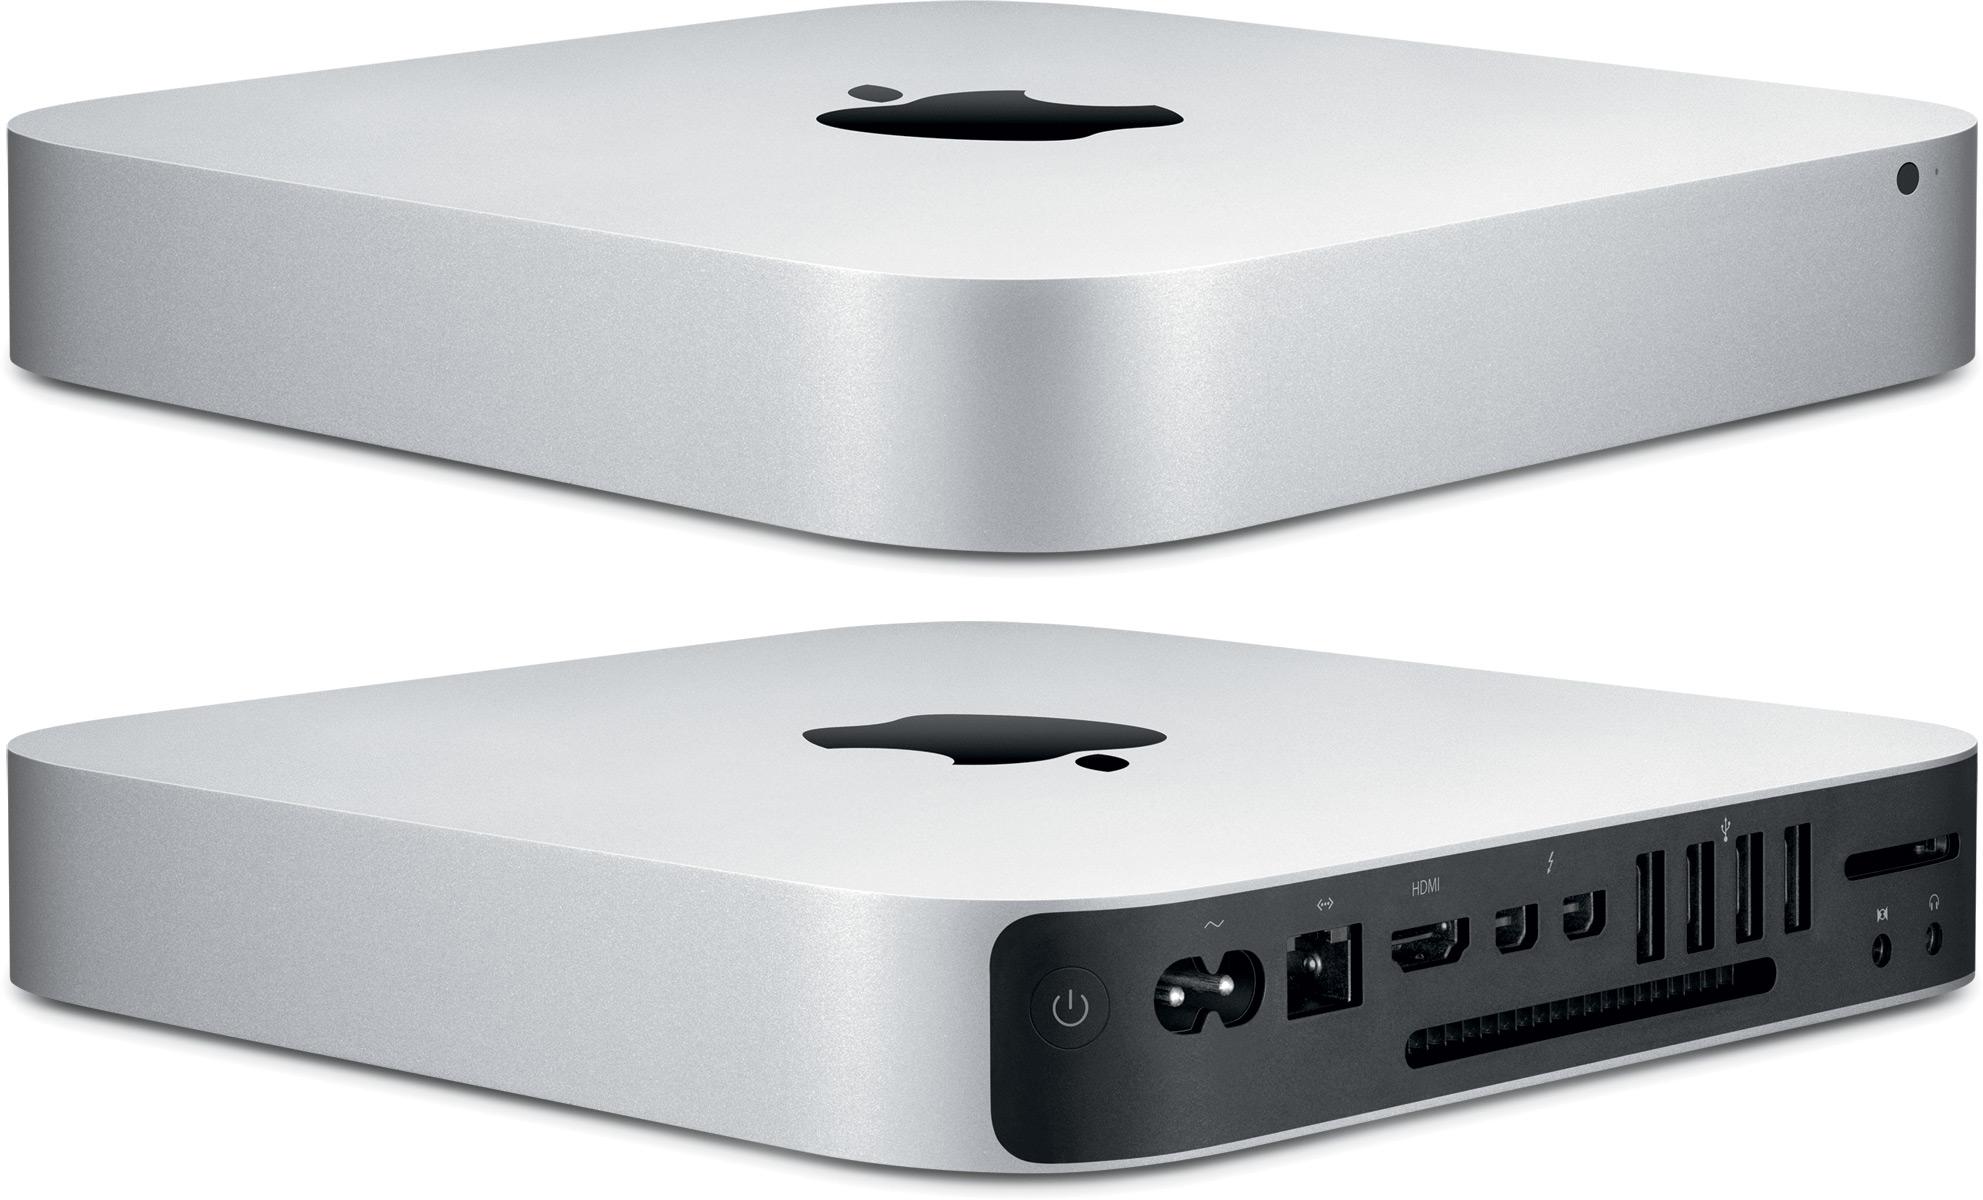 meilleur prix en ligne ici trouver le prix le plus bas Apple annuncia iPad Air 2 e iPad mini 3, ma c'e' spazio ...